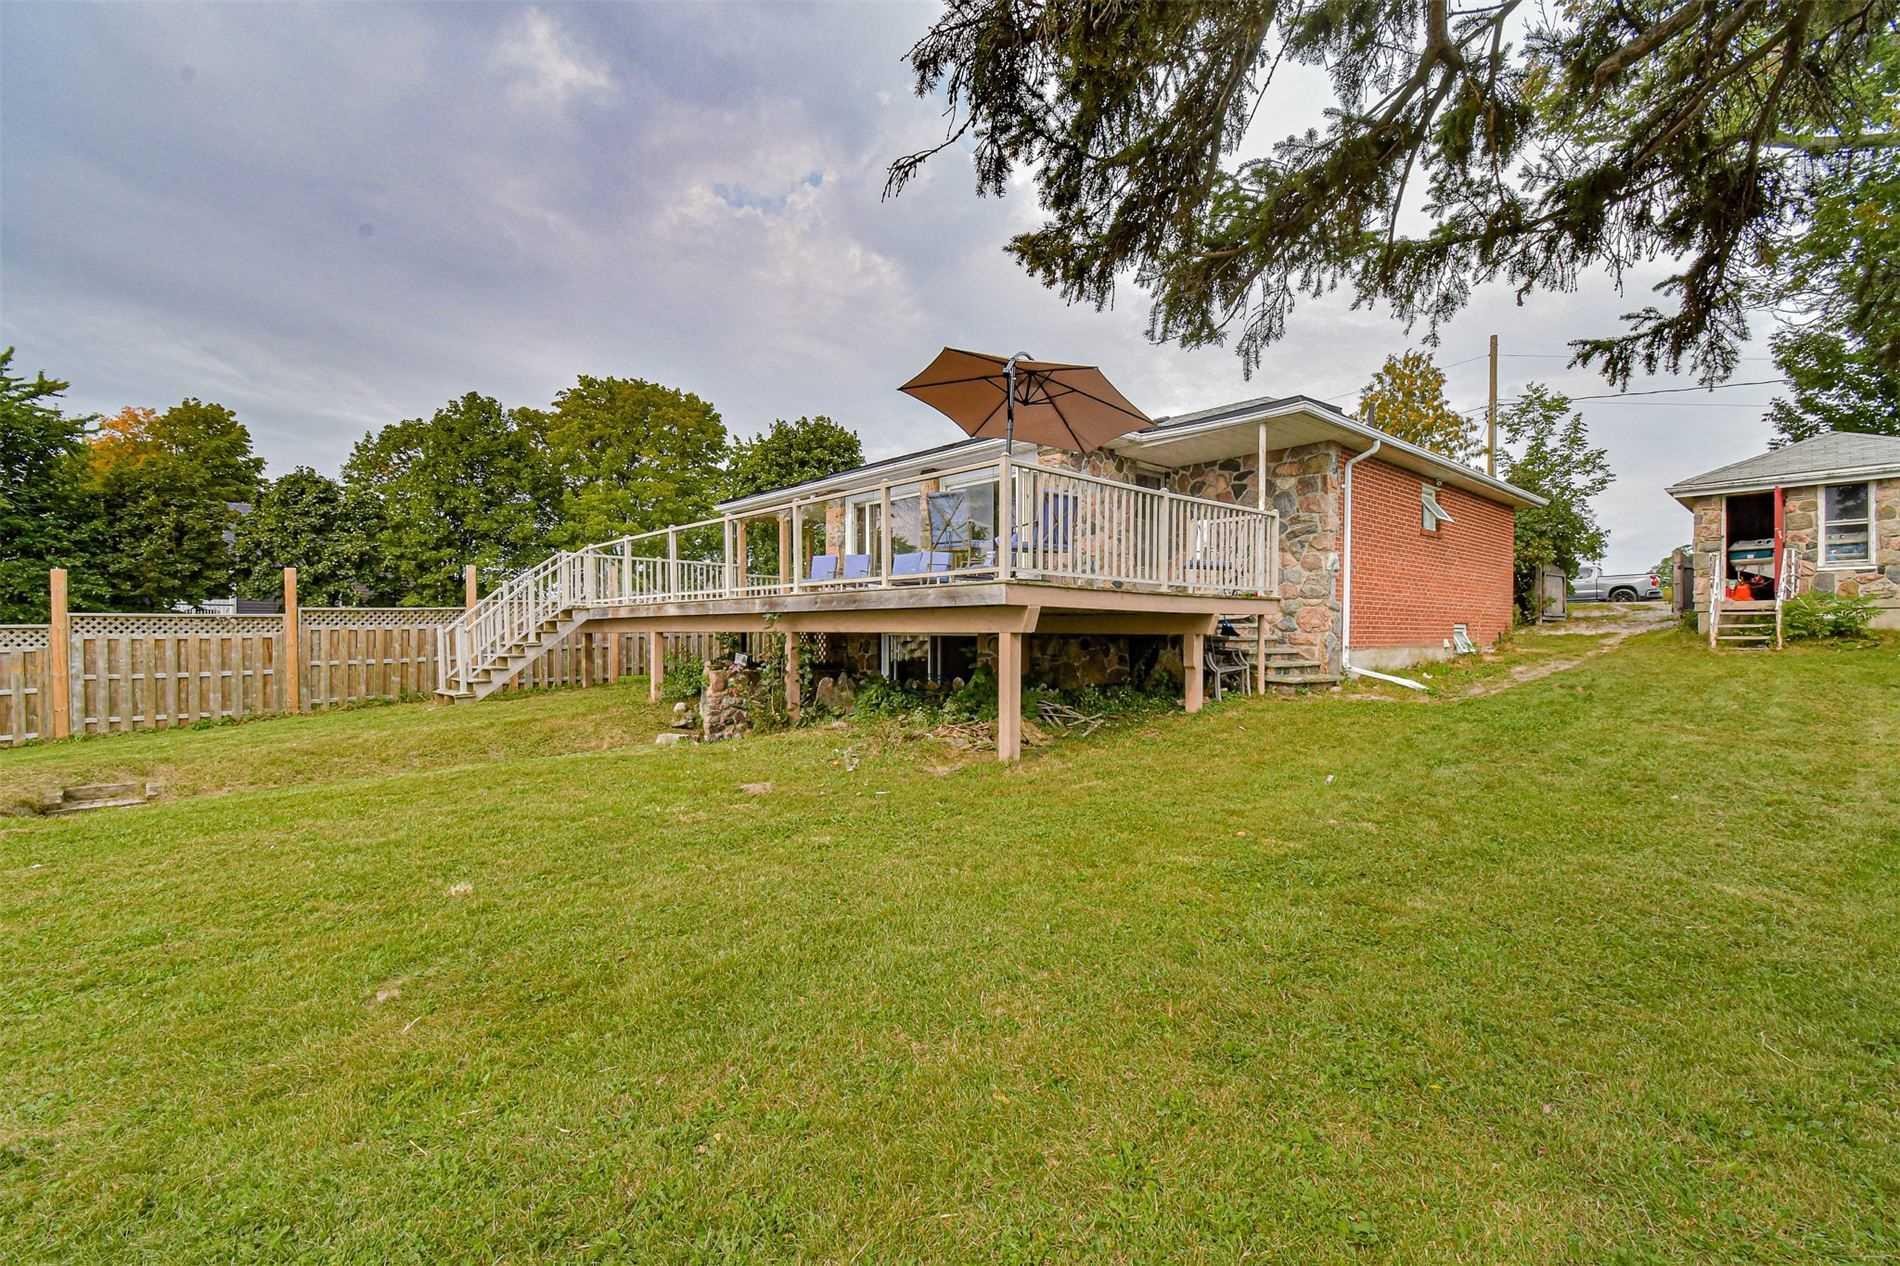 Detached house For Sale In Kawartha Lakes - 43 Marsh Creek Rd, Kawartha Lakes, Ontario, Canada K0M 2C0 , 2 Bedrooms Bedrooms, ,2 BathroomsBathrooms,Detached,For Sale,Marsh Creek